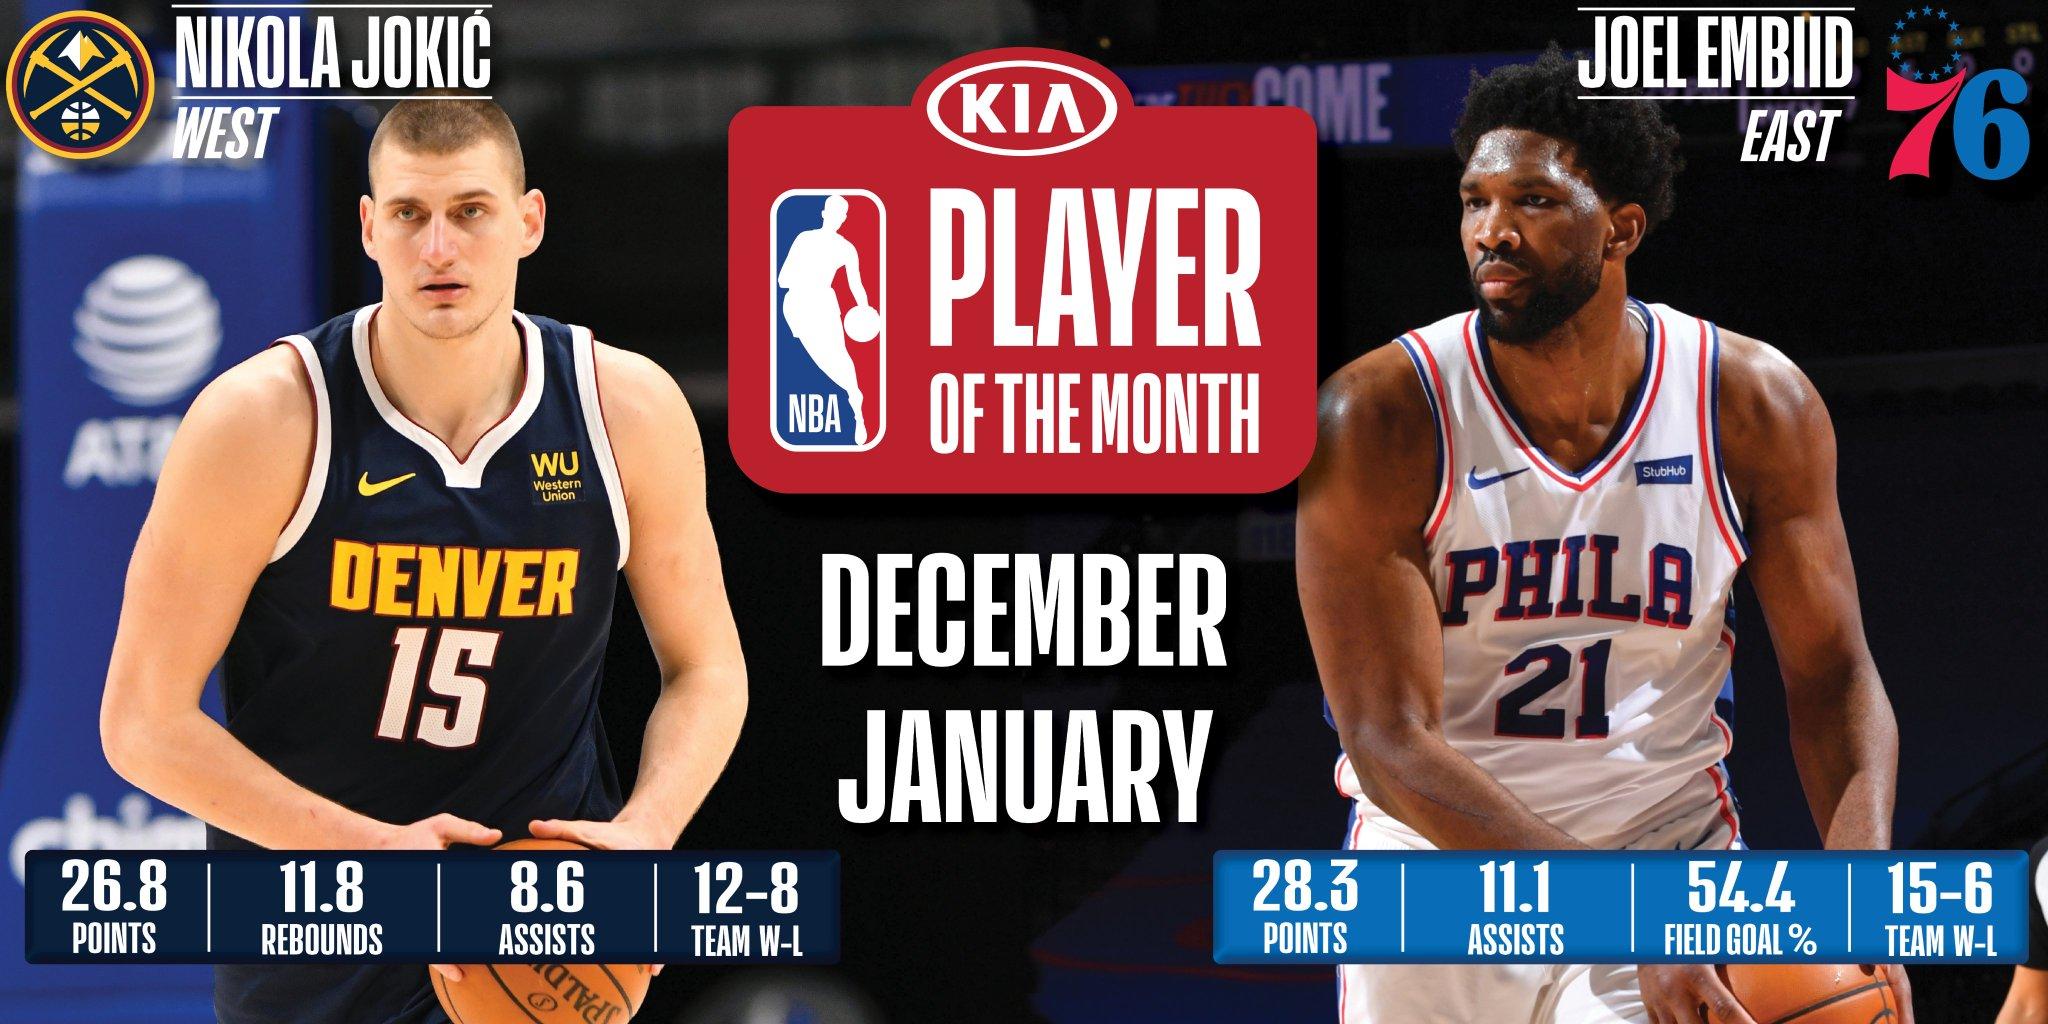 Nikola Jokic, Joel Embiid named Kia NBA Players of the Month